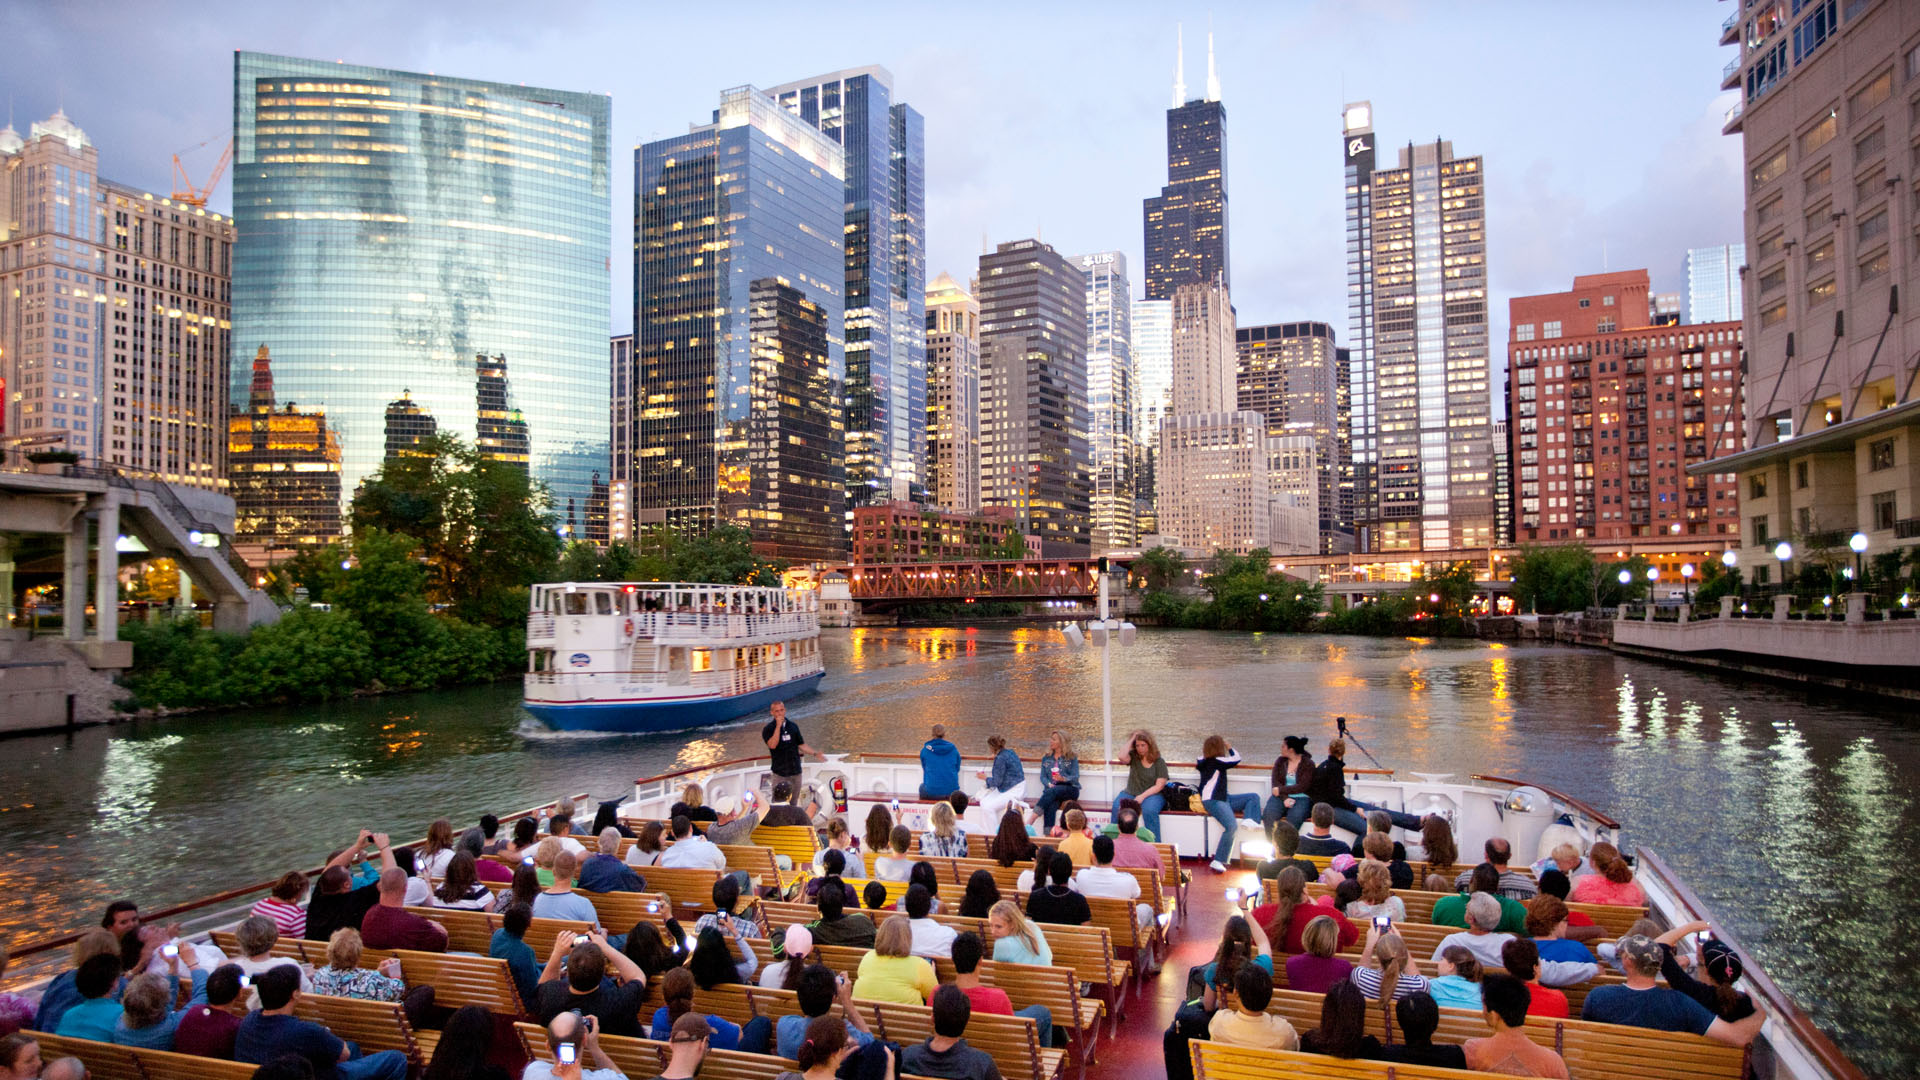 Shoreline Sightseeing Architecture River Tour